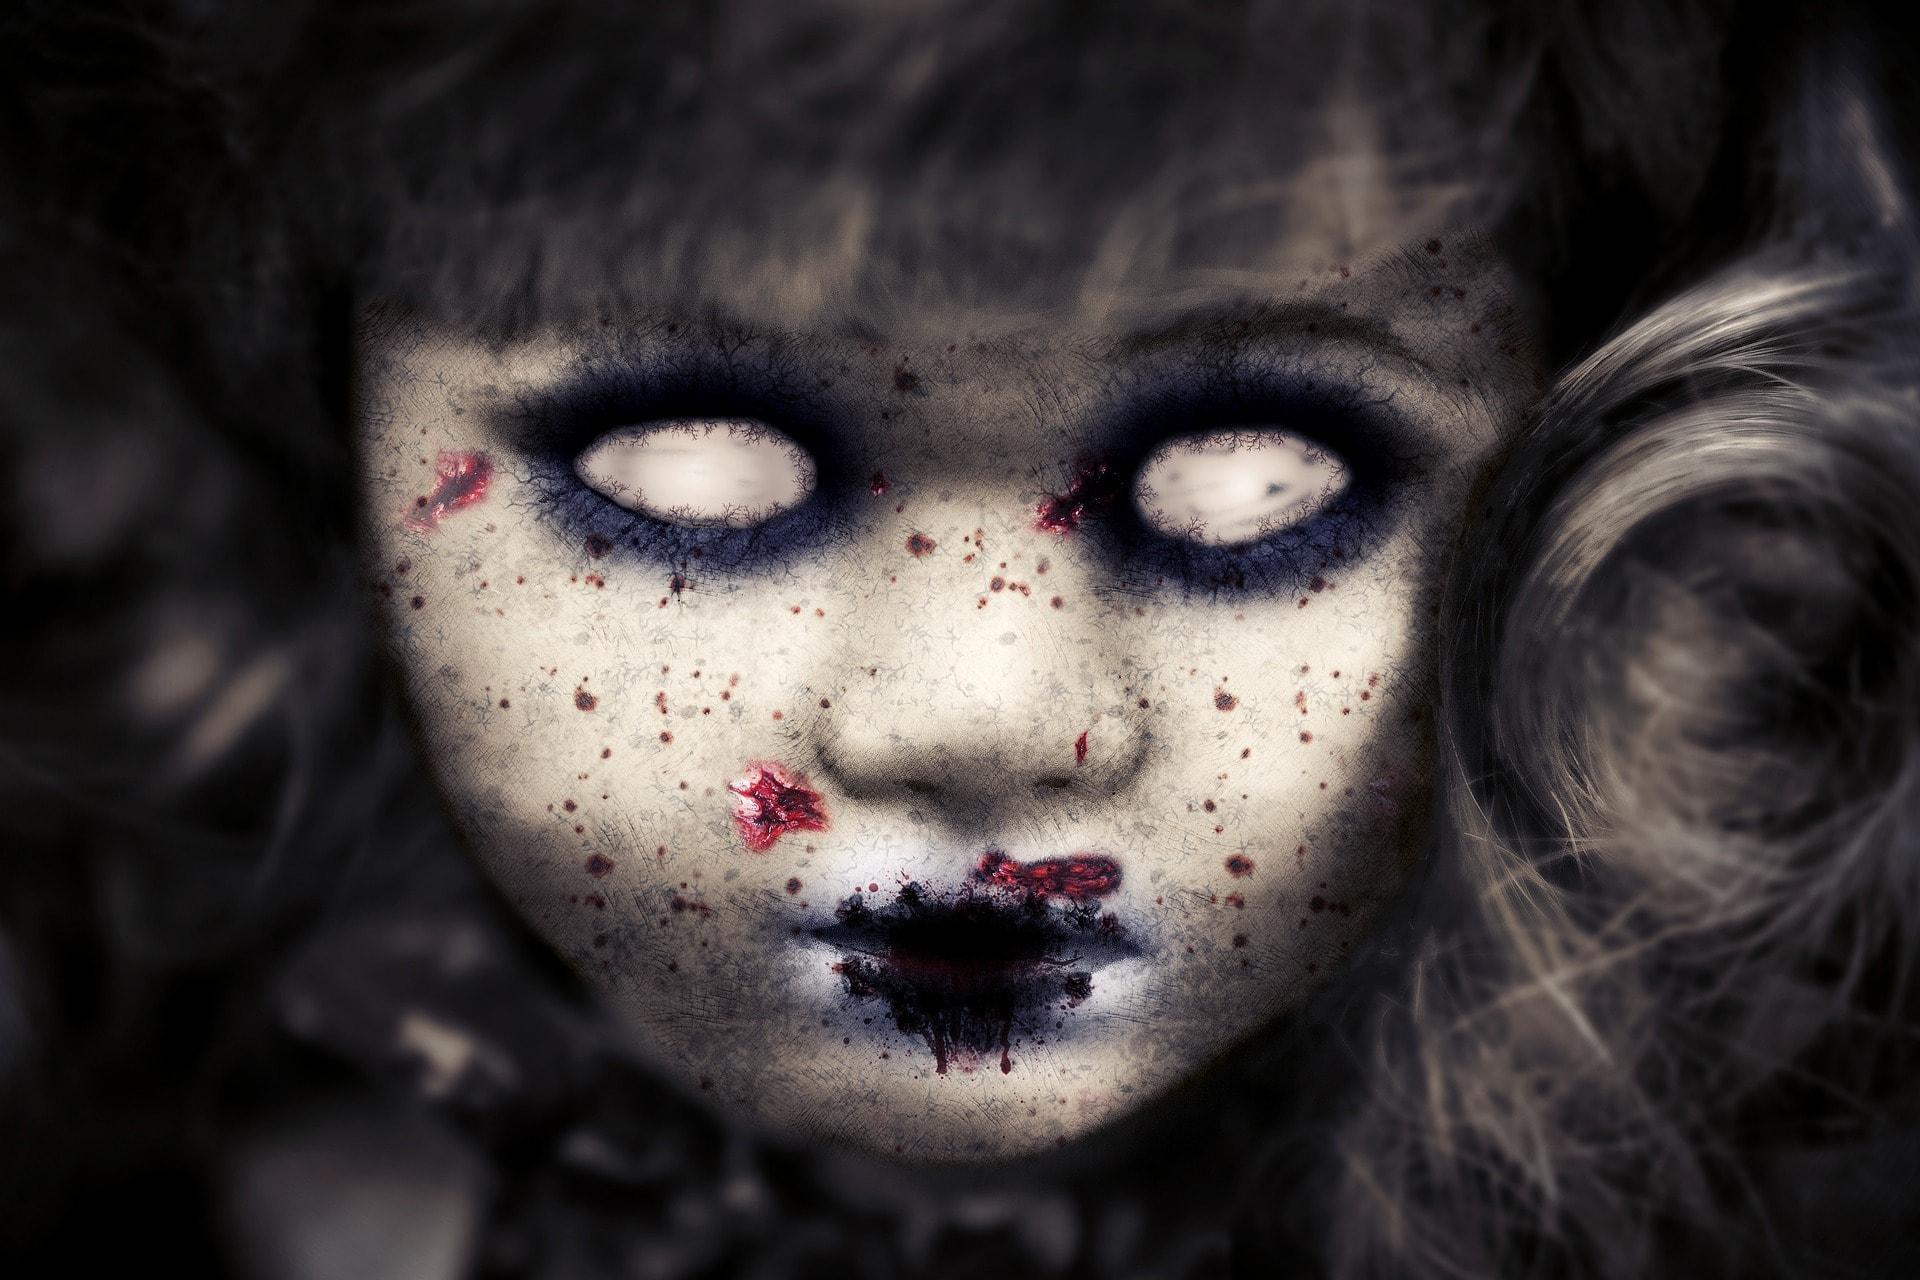 zombie-2554660_1920.jpg